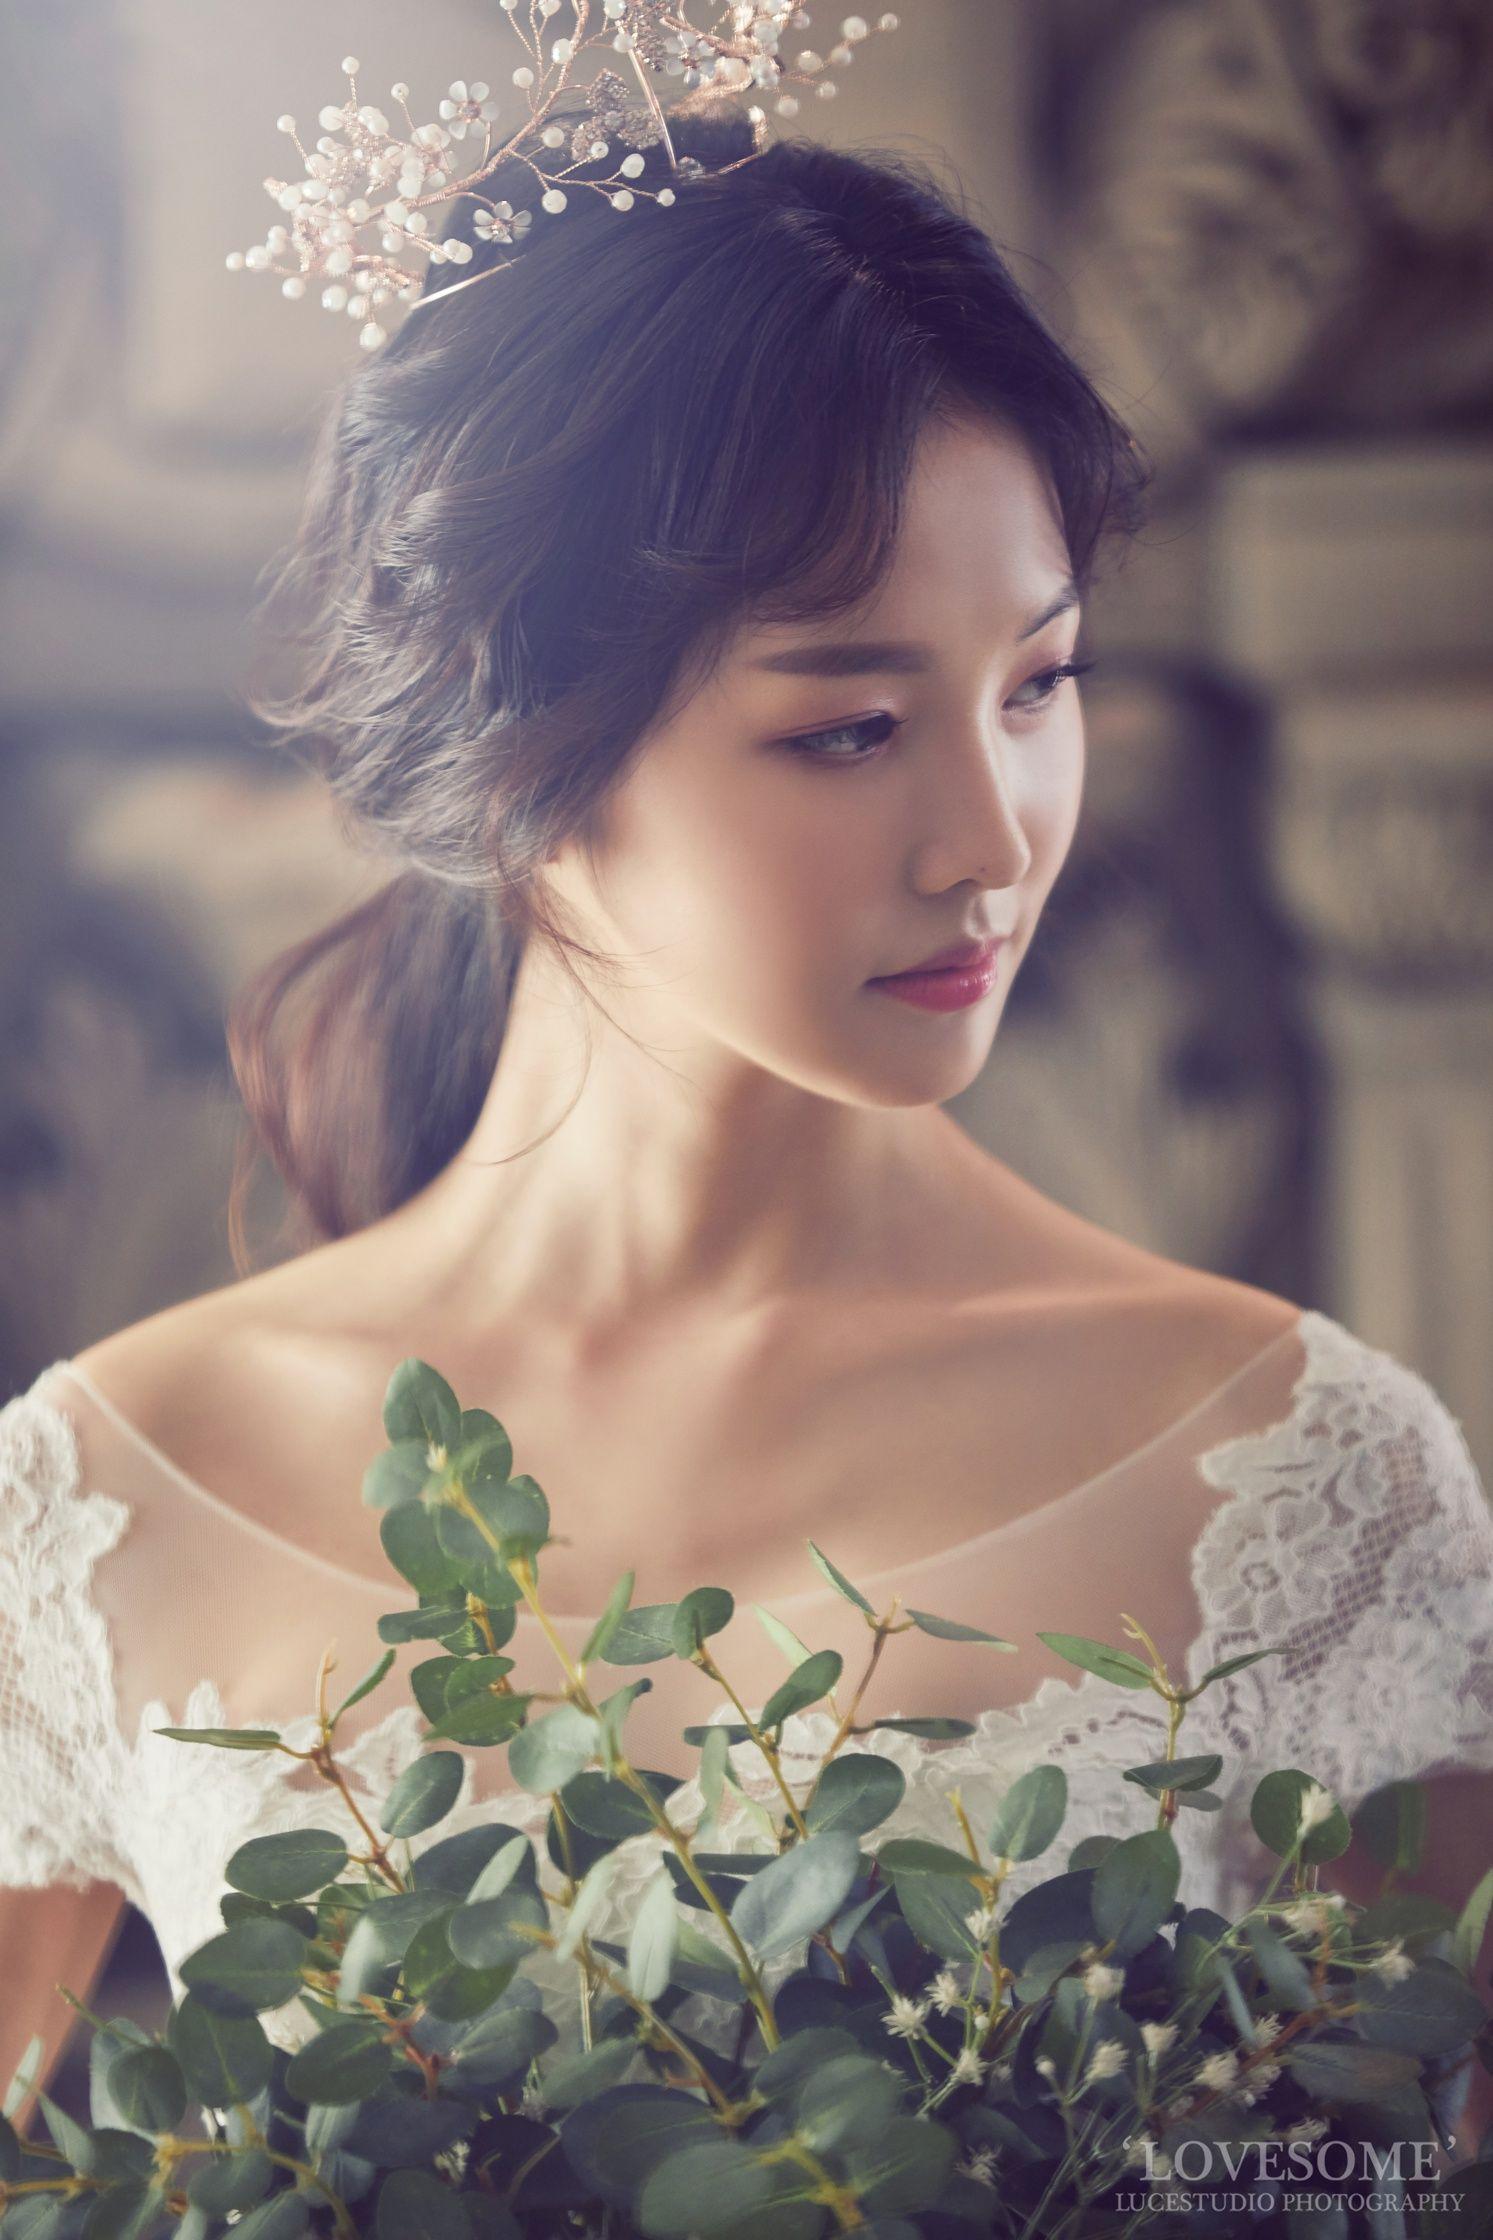 LUCE STUDIO [LOVESOME] Korean wedding photography, Pre